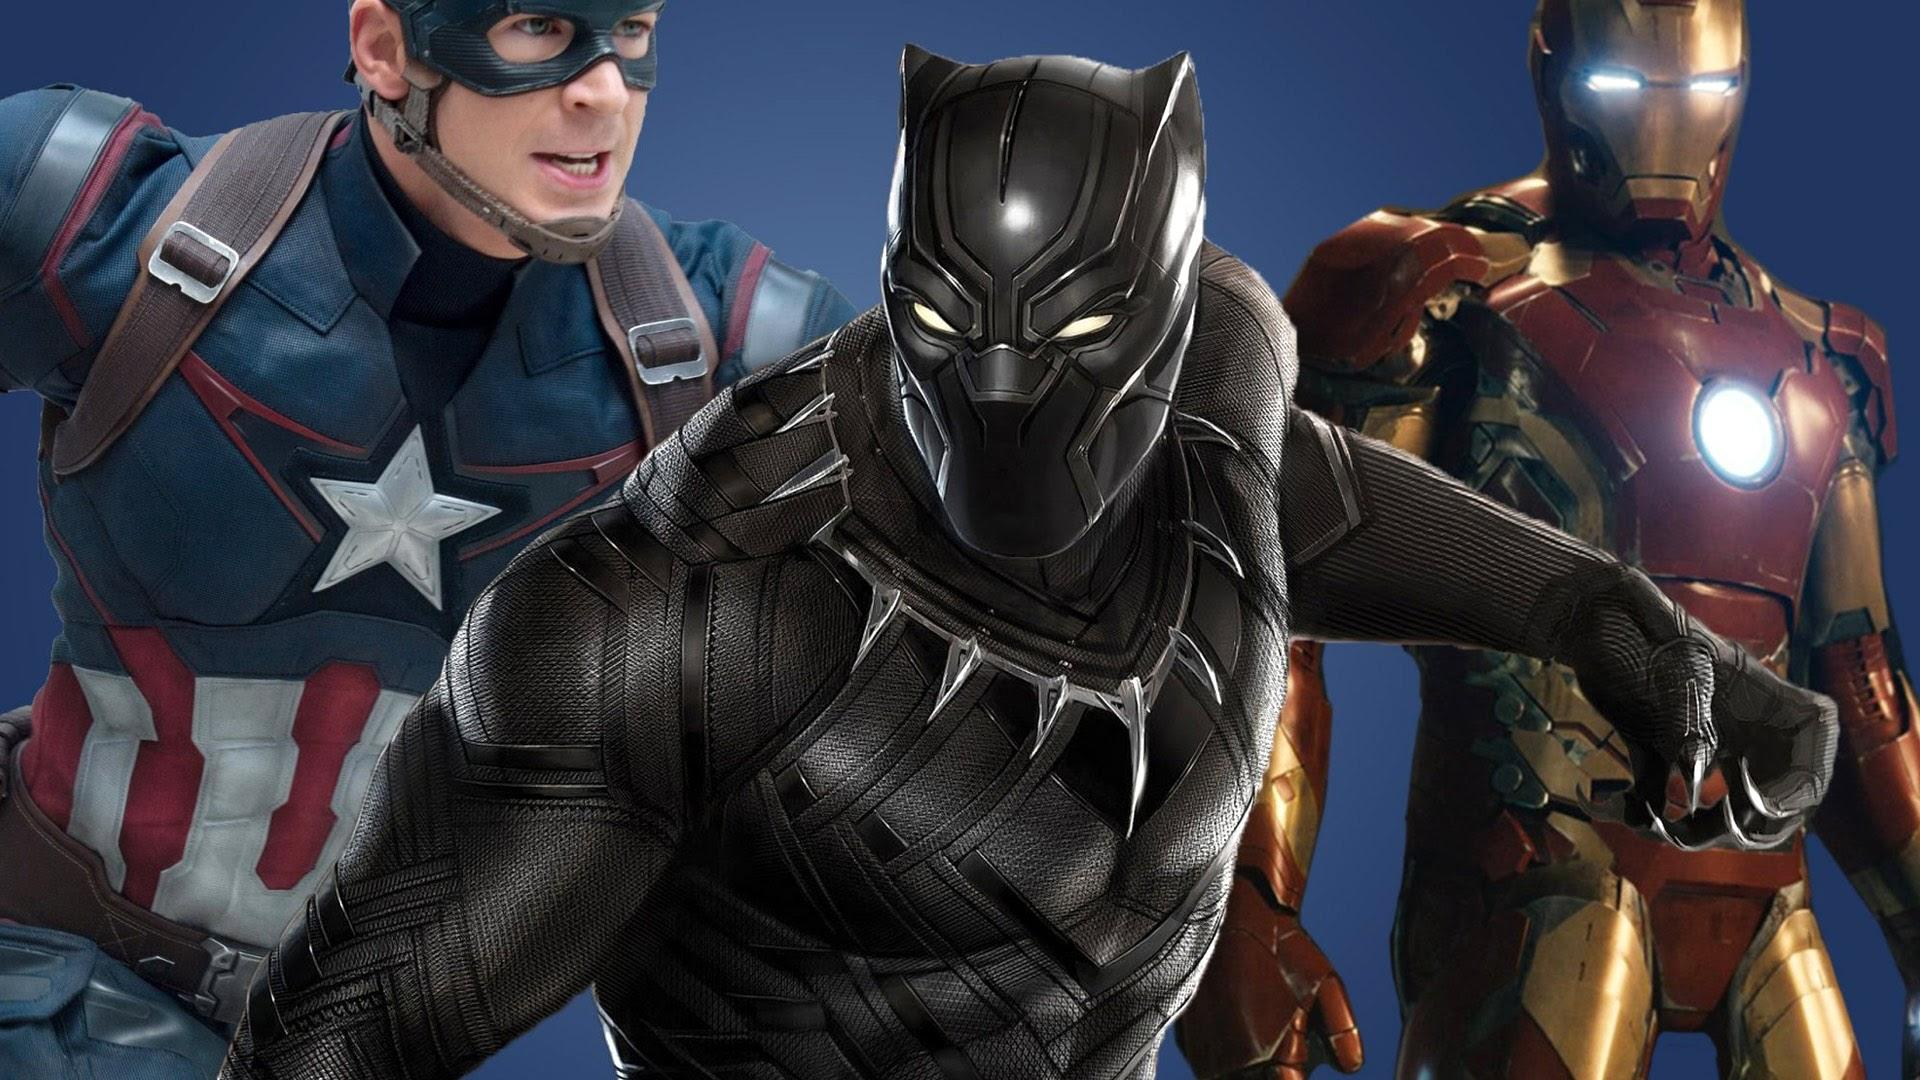 Good Wallpaper Movie Captain America Civil War - Ironman-captain-america-civil-war-black-panther-wallpaper-hd-1080p-desktop  Best Photo Reference_776291.jpg